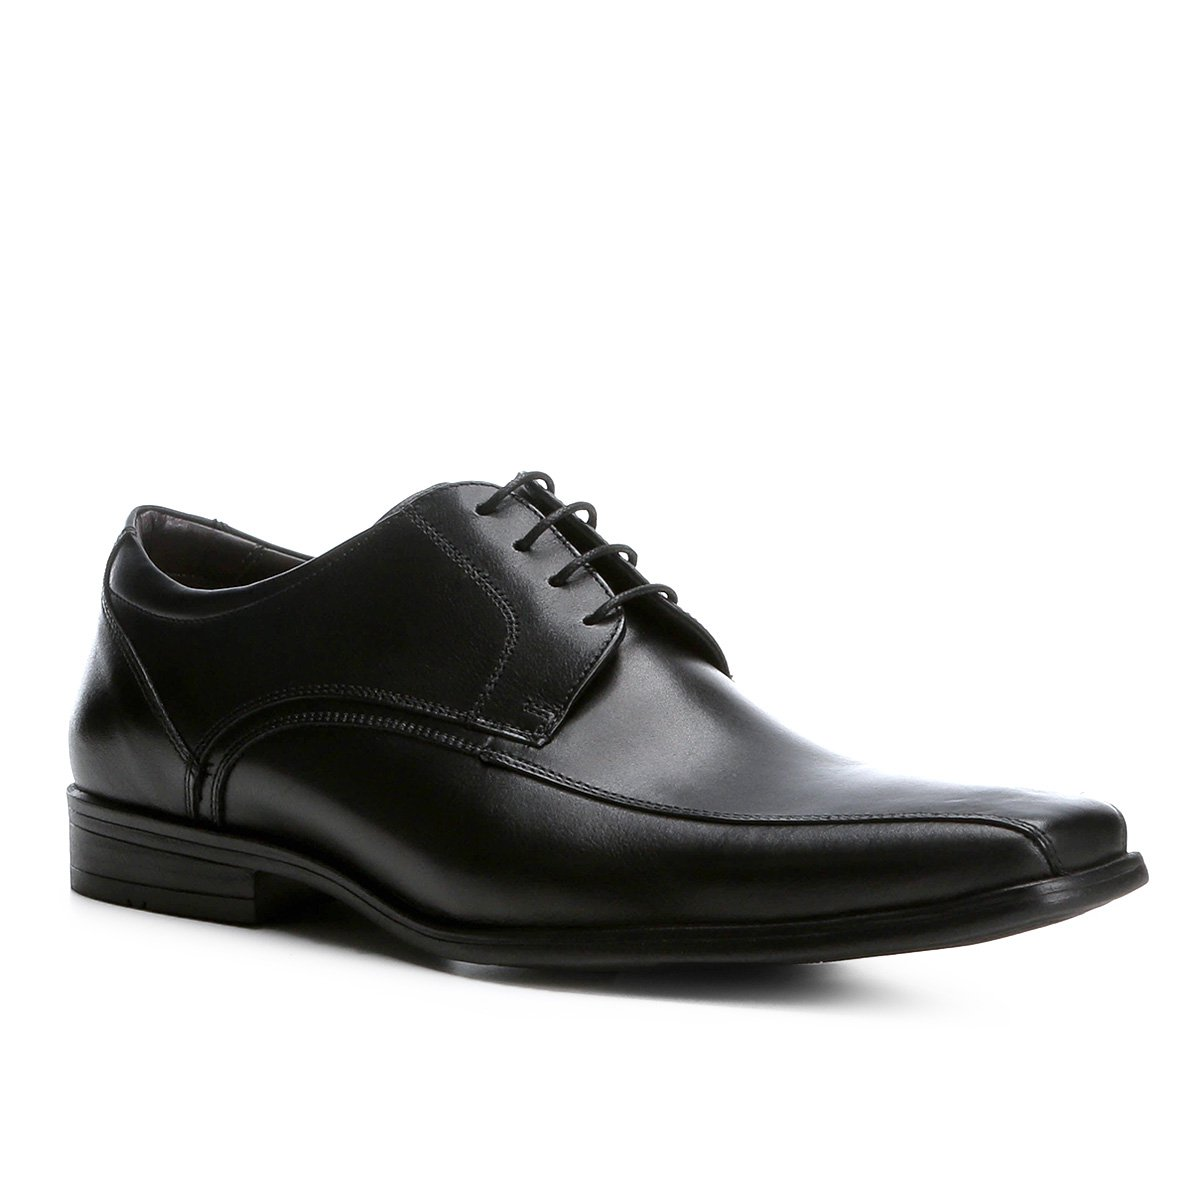 TRADICIONAL Sapato Social Sapato Shoestock Social COURO COURO Shoestock Preto TRADICIONAL TqxRUqwZ